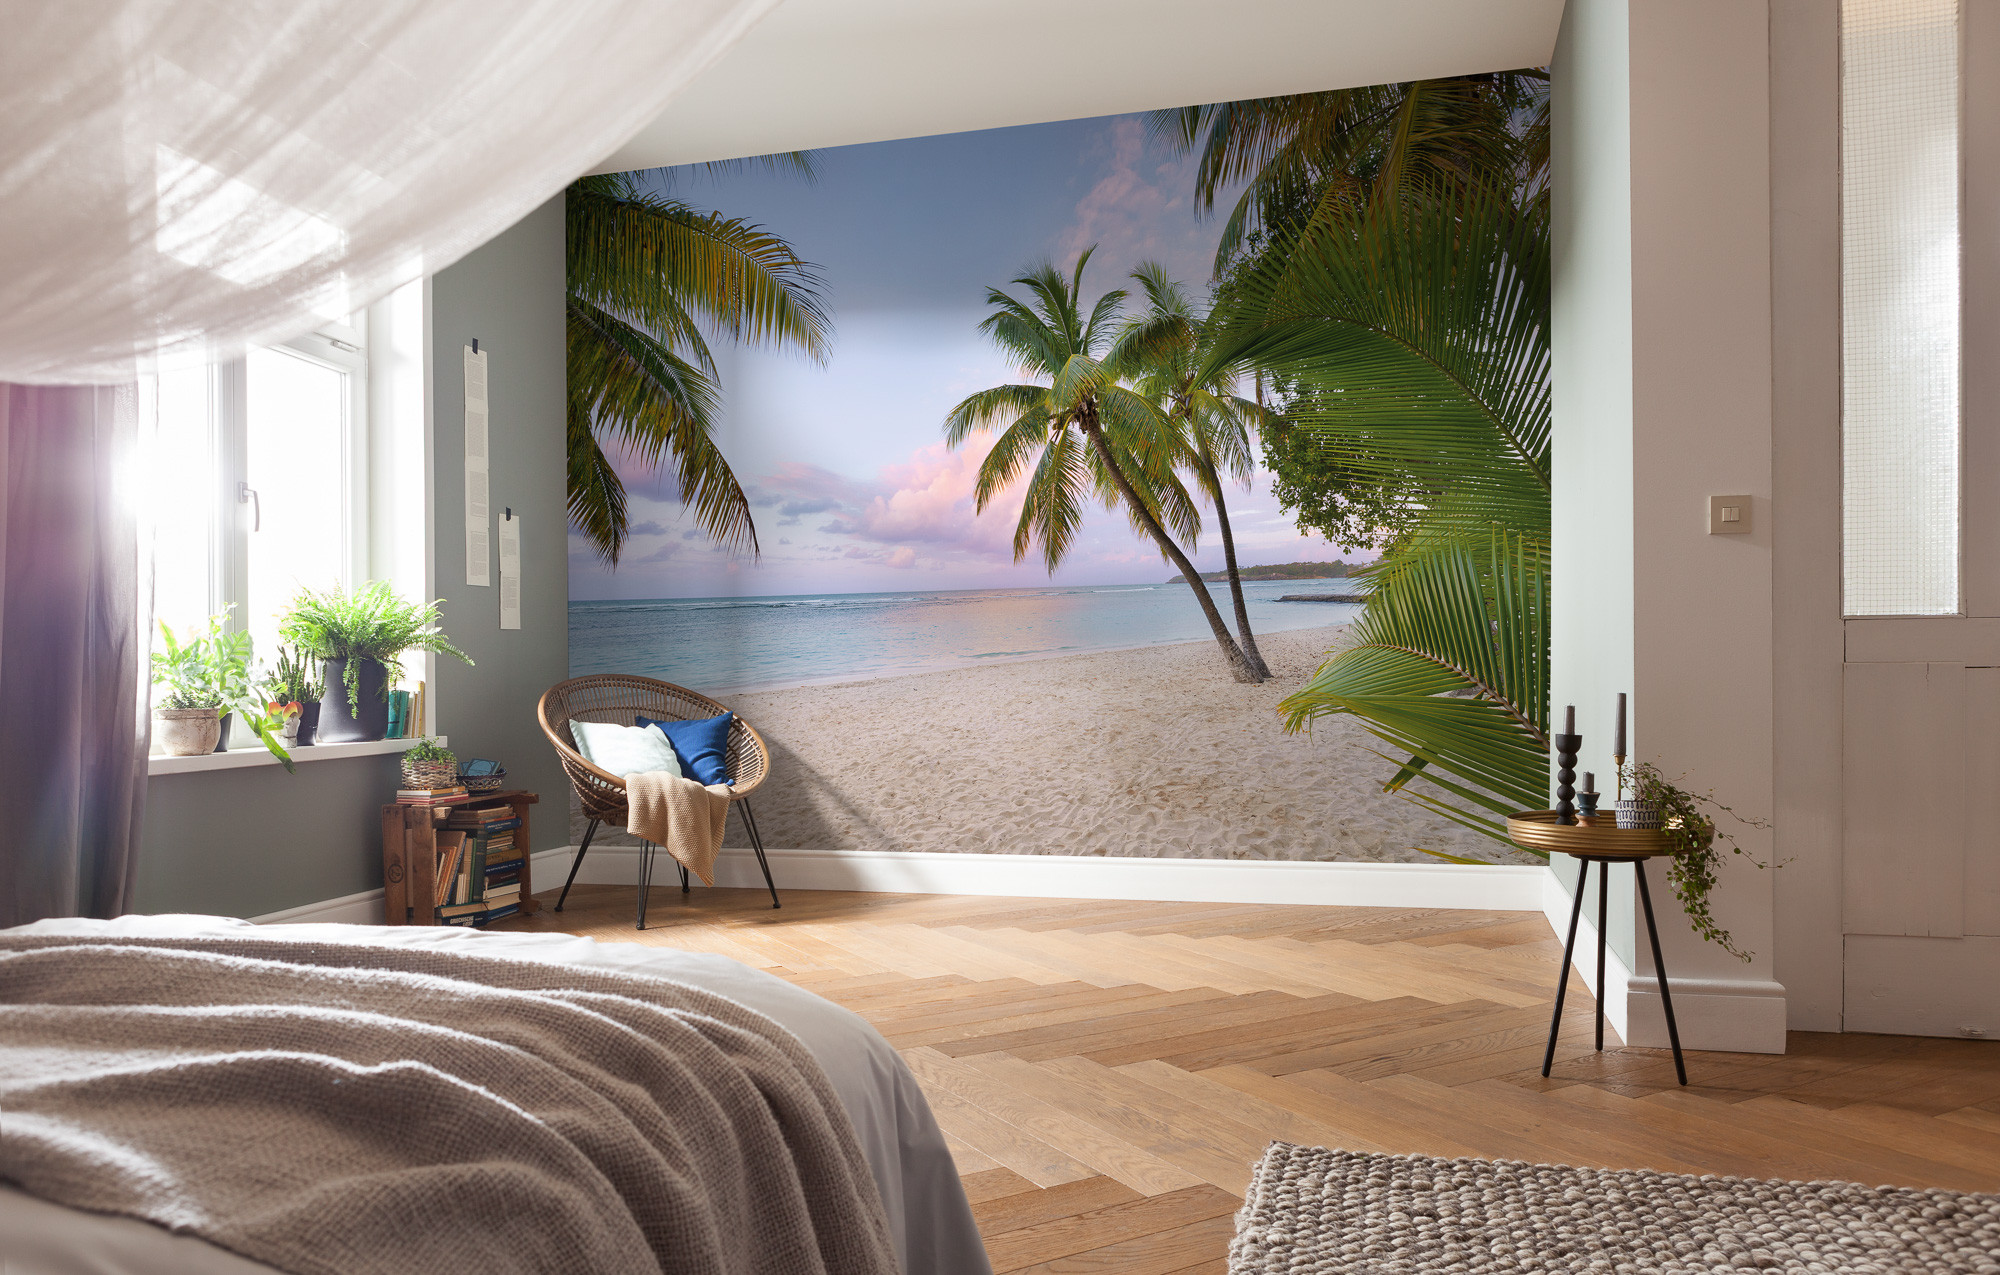 vliestapete paradise morning von national geographic. Black Bedroom Furniture Sets. Home Design Ideas